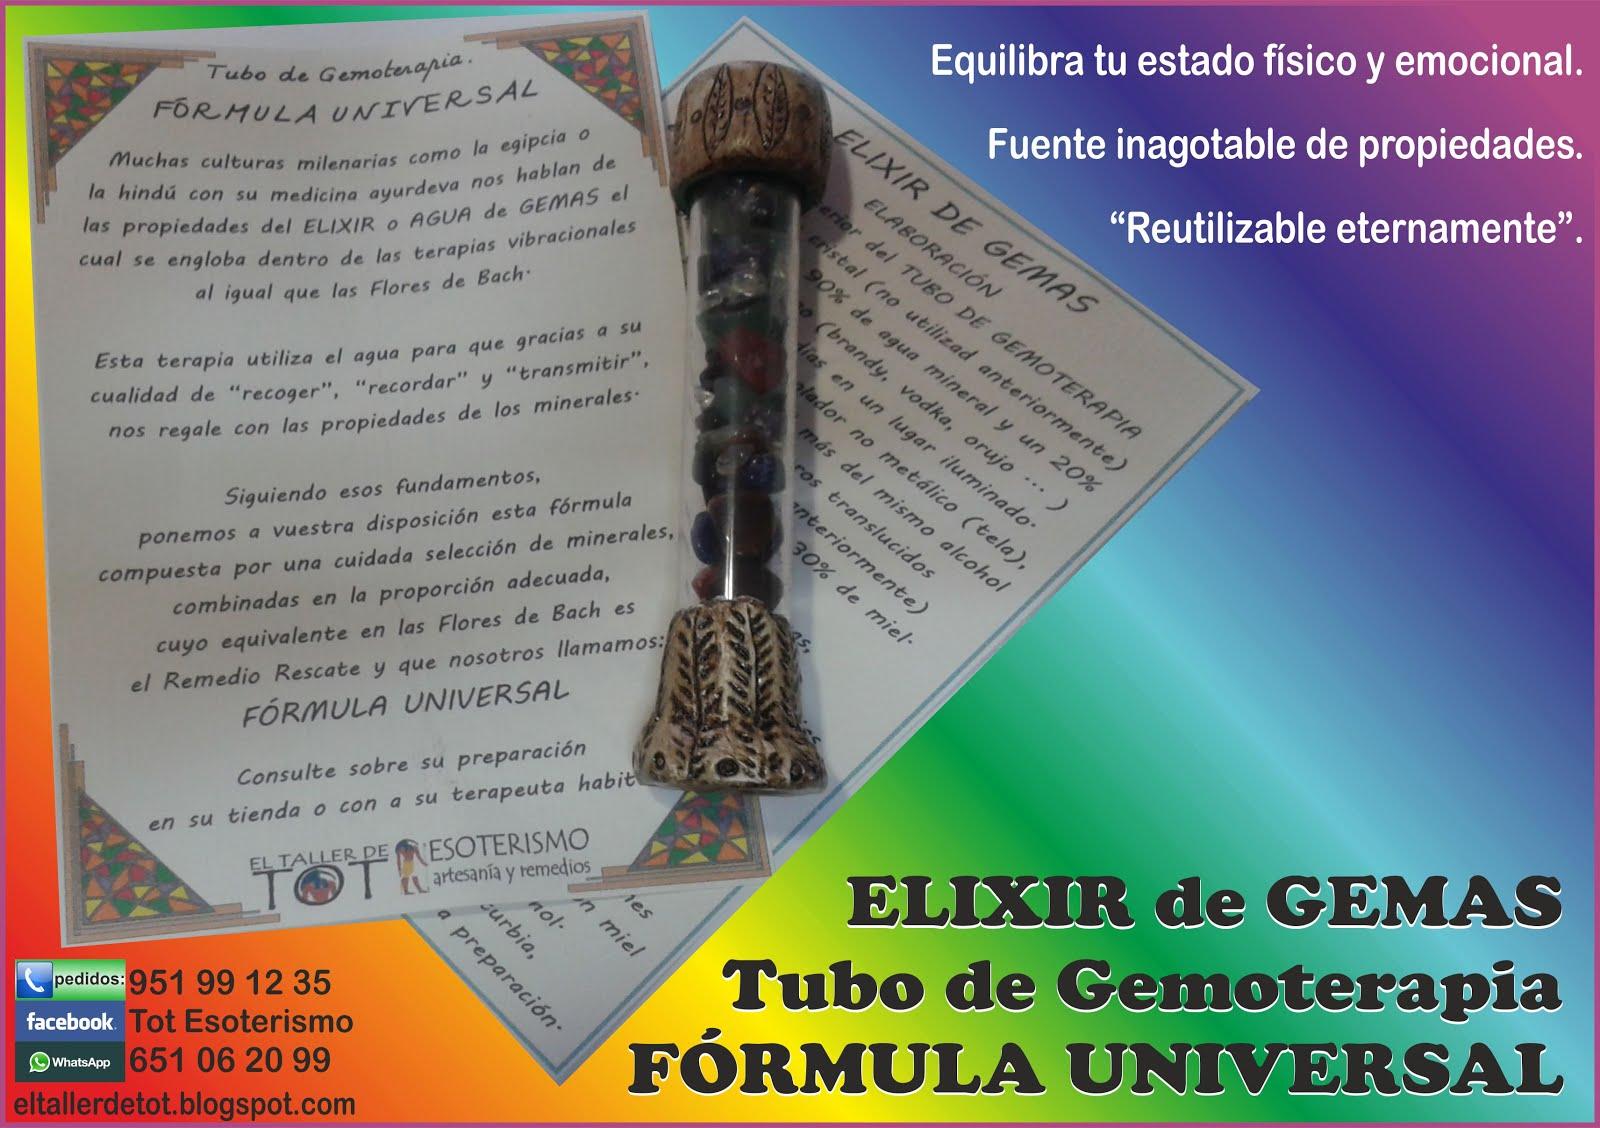 ELIXIR DE GEMAS